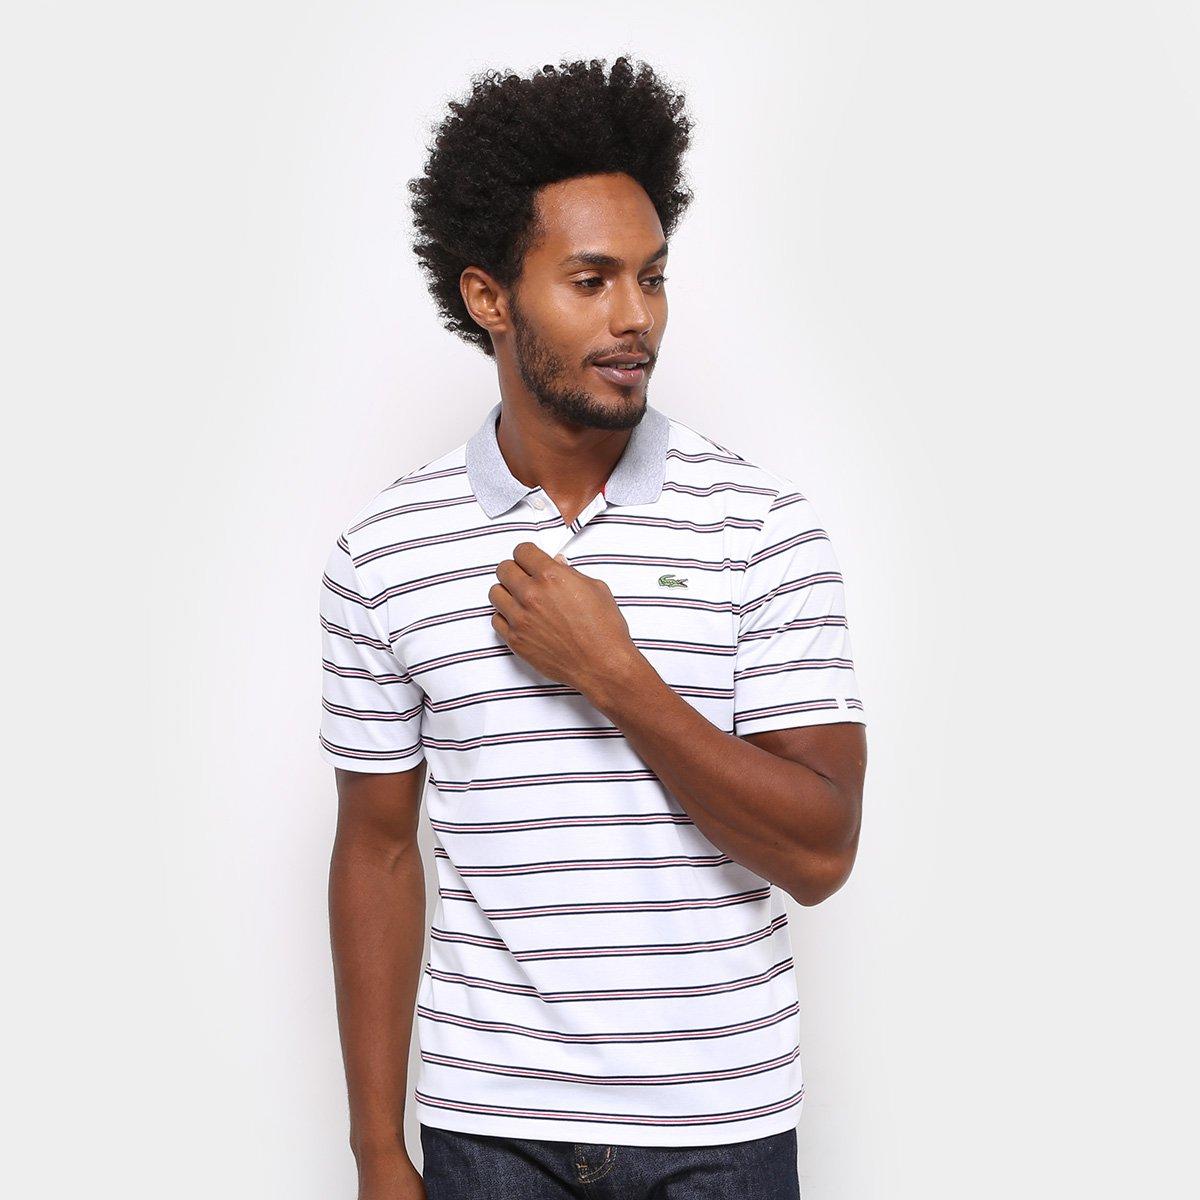 90ca21e9583c1 Camisa Polo Lacoste Listras Masculina - Branco - Compre Agora